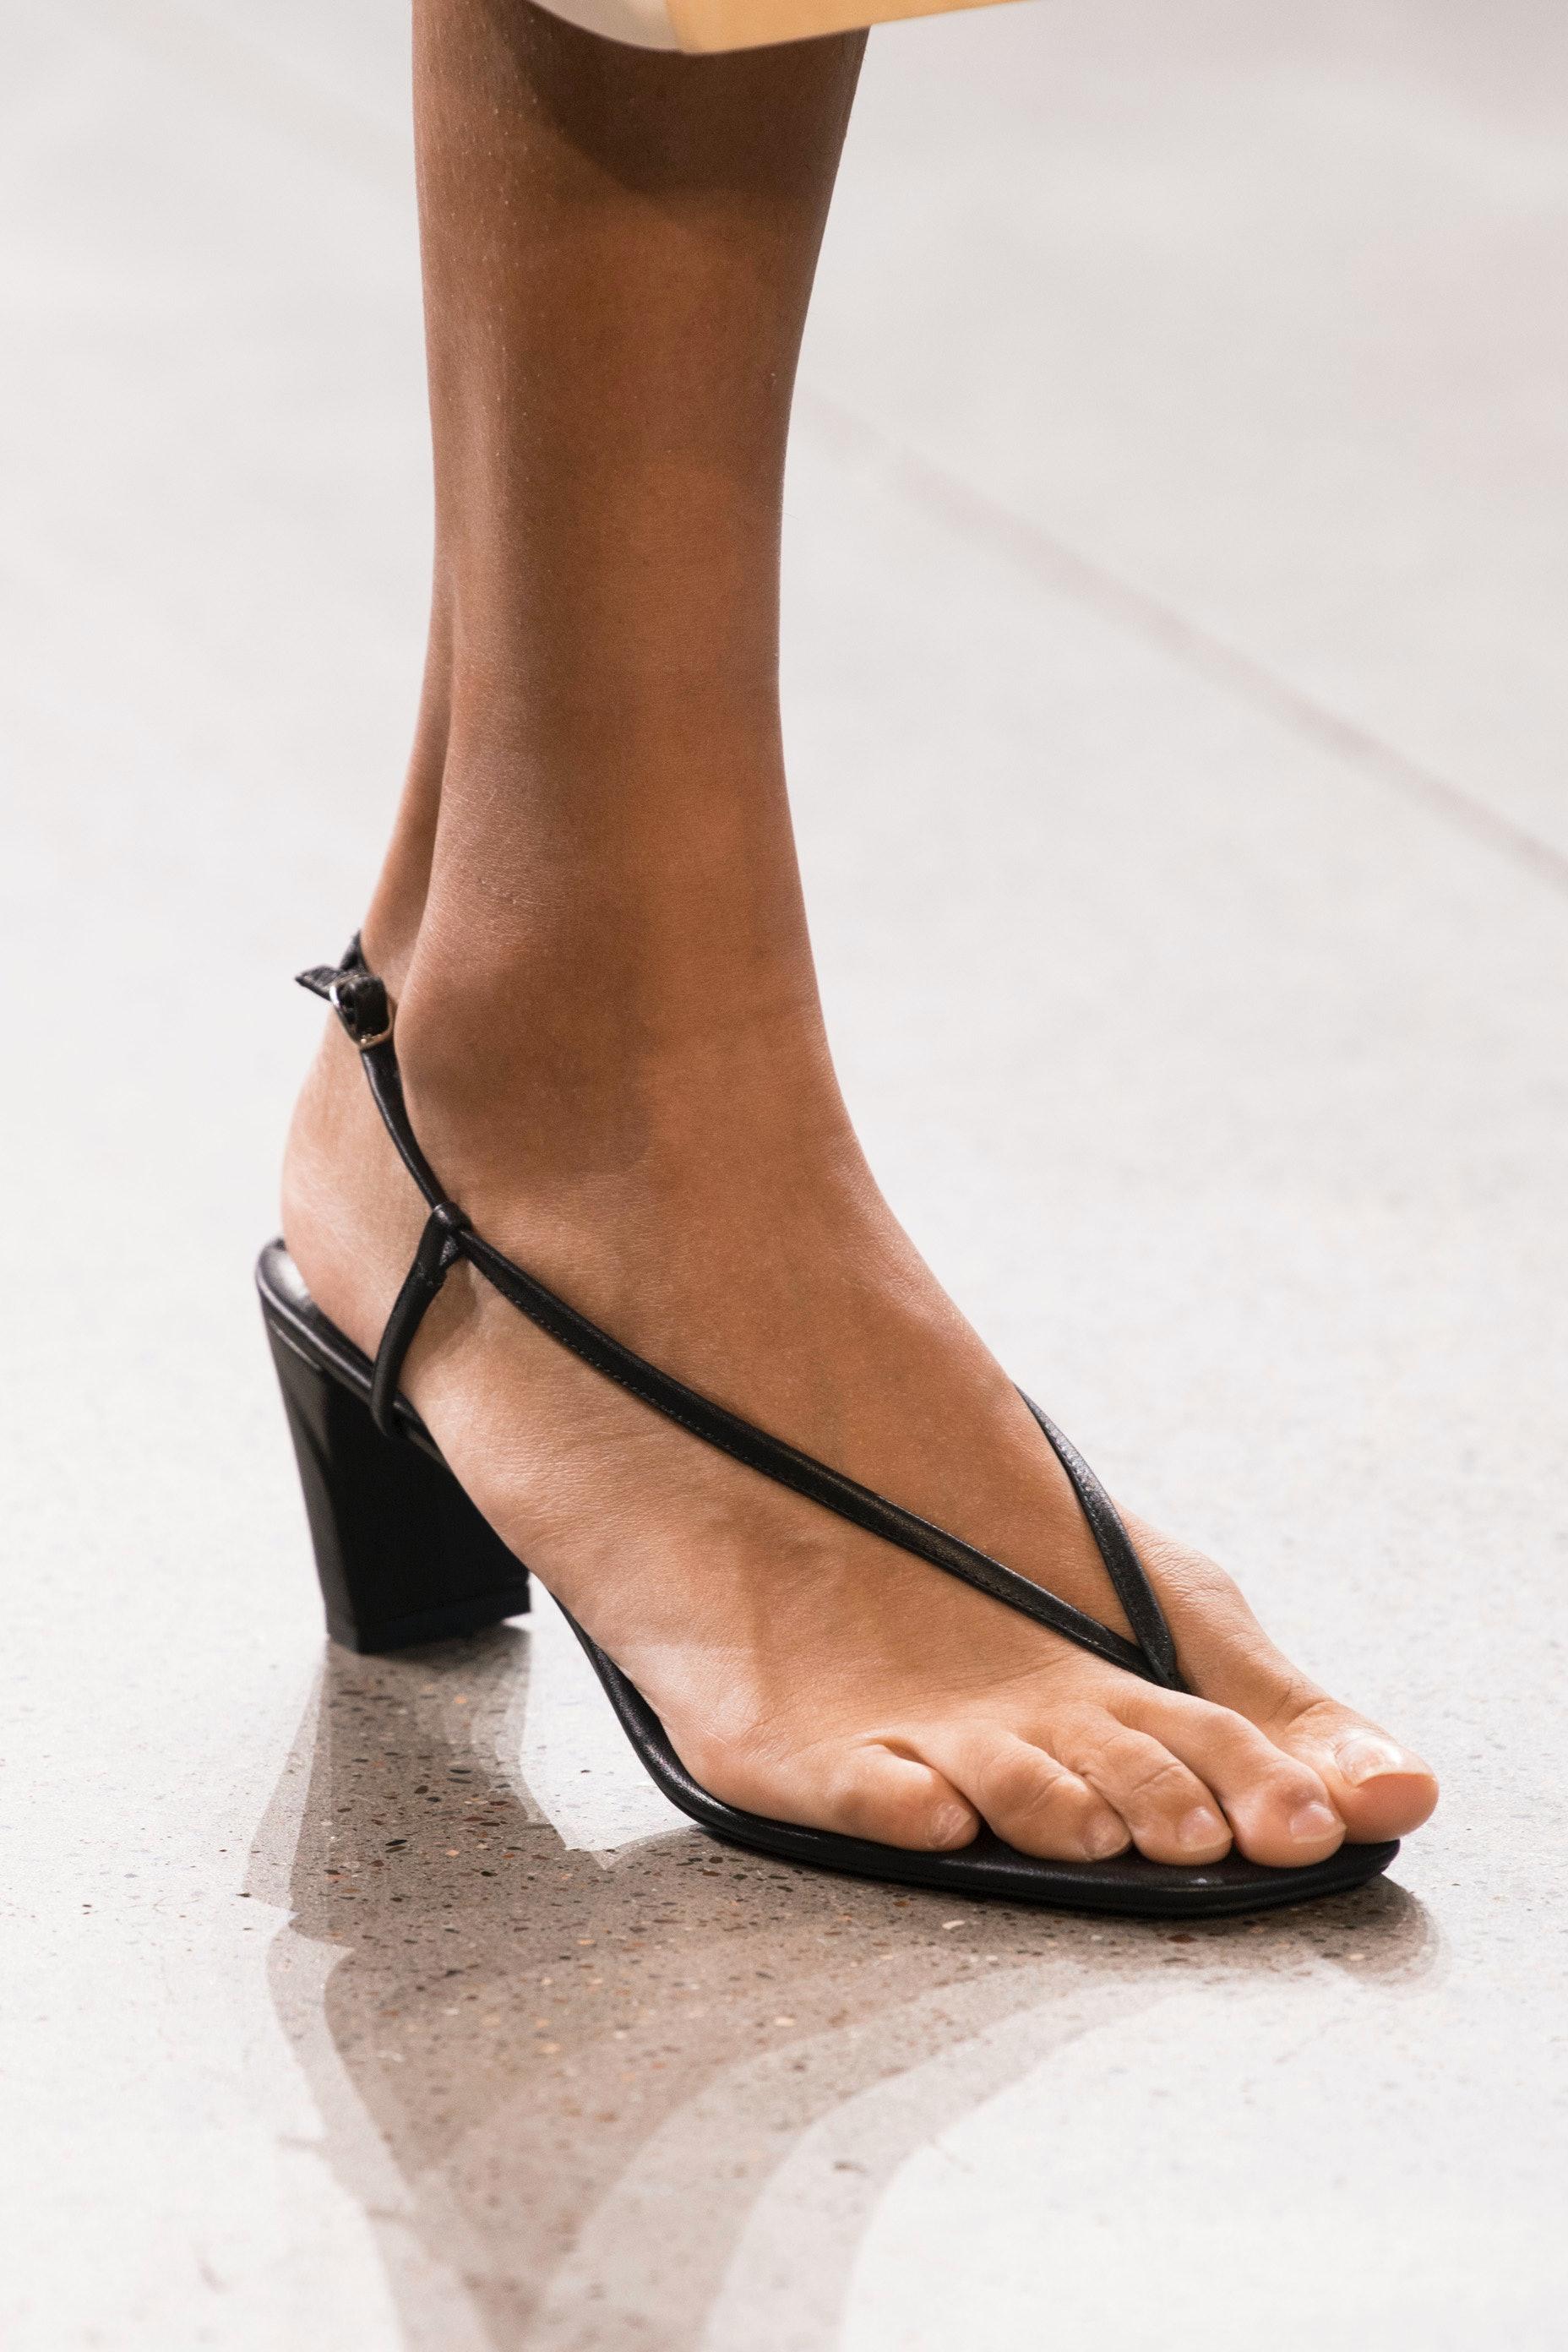 How to Wear Flip Flops, The Major Shoe